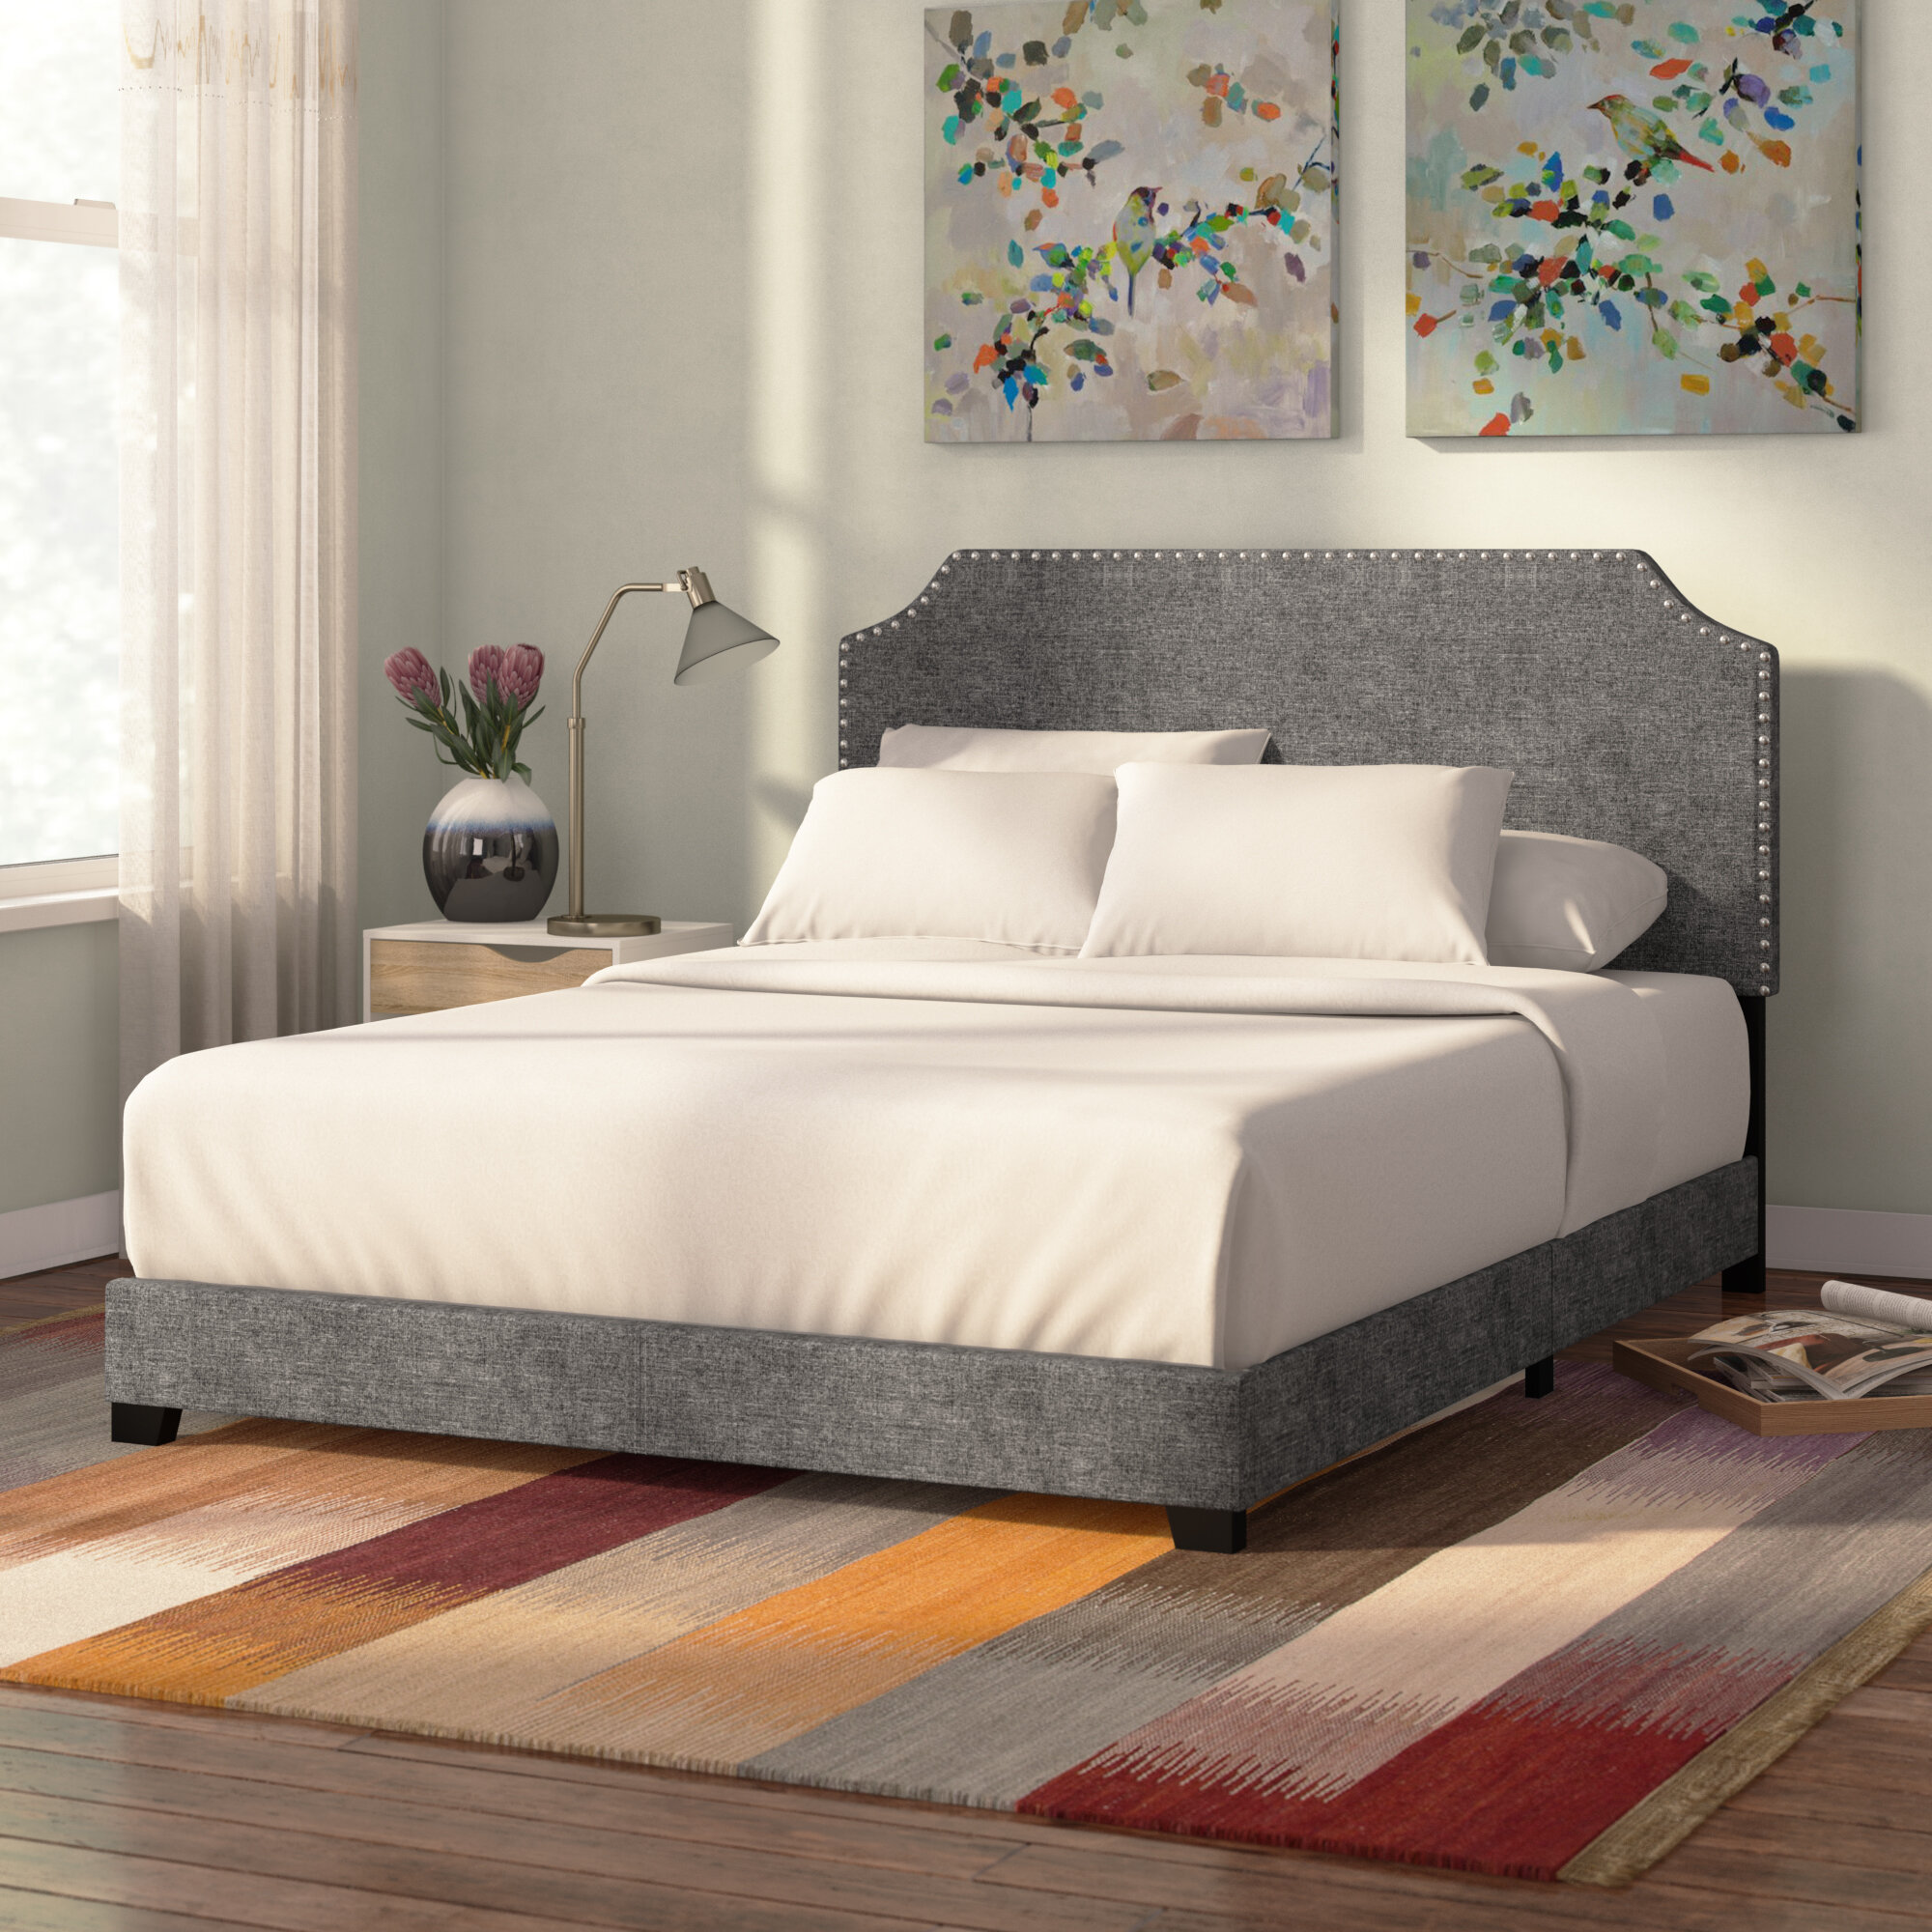 Zipcode Design Kyara Upholstered Panel Bed Reviews Wayfair